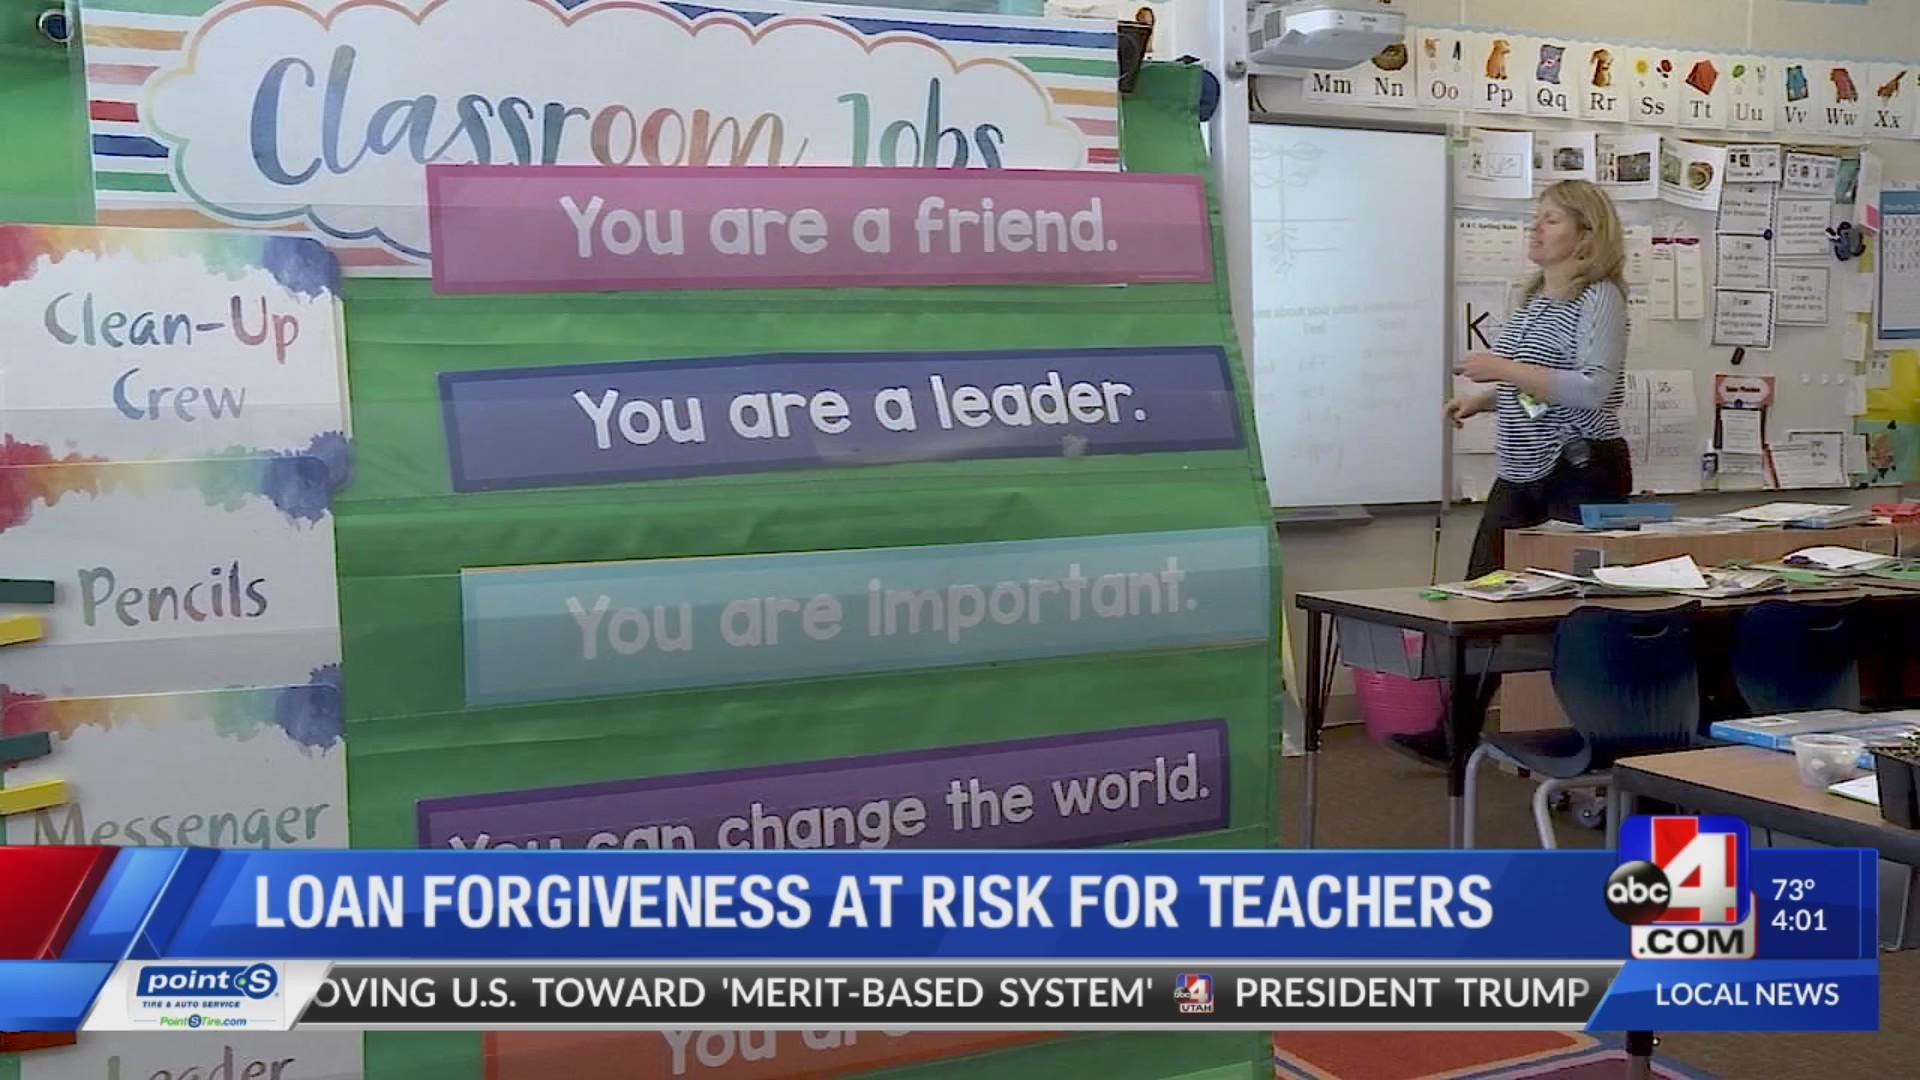 Teacher loan forgiveness program at risk